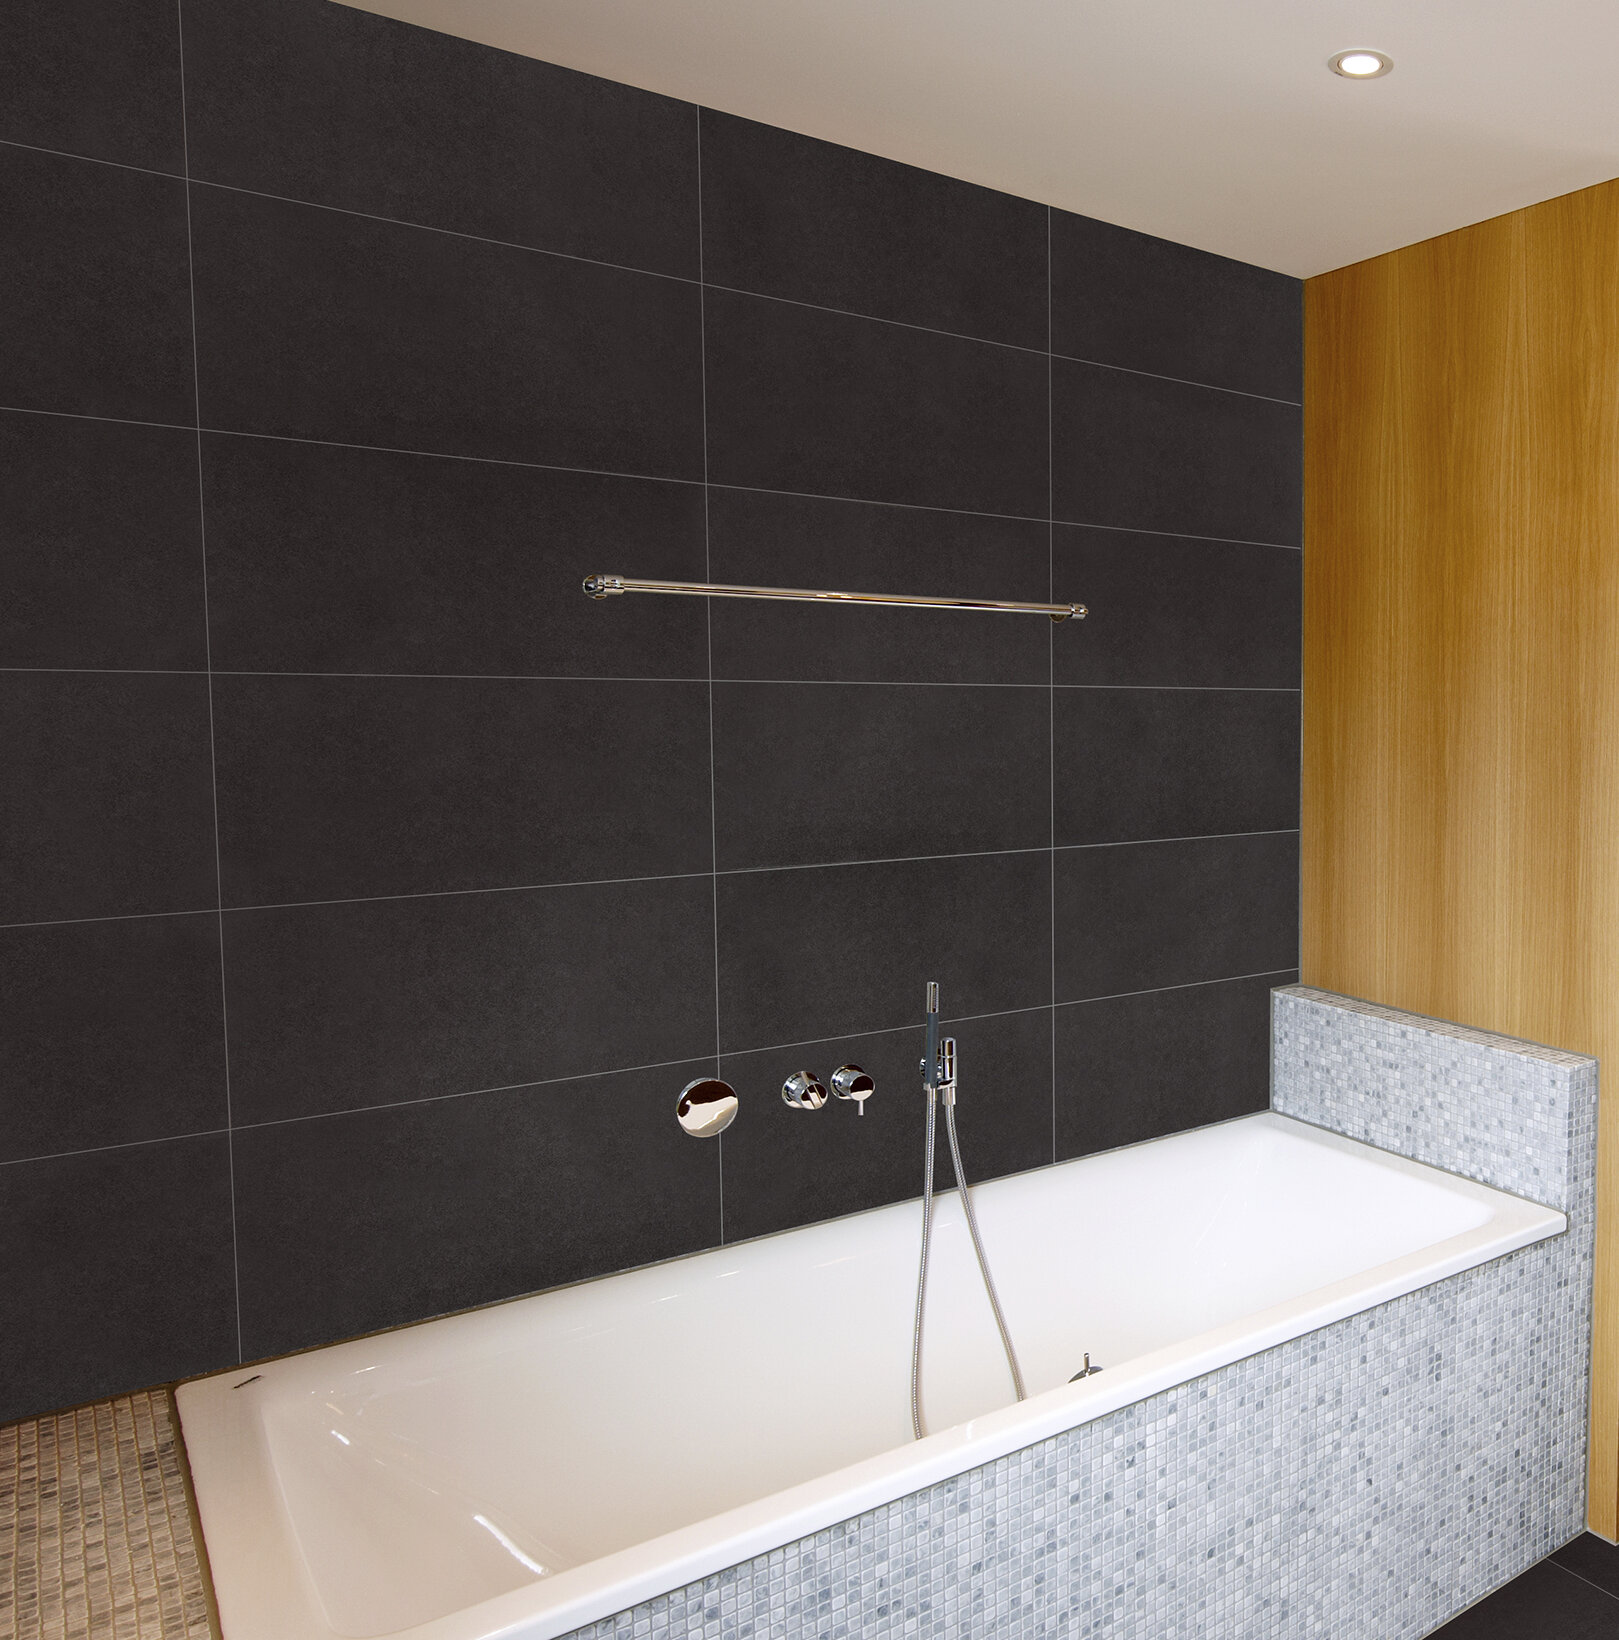 12x24 Tile Patterns For Bathrooms: Lovely 12 X 24 Bathroom Tile